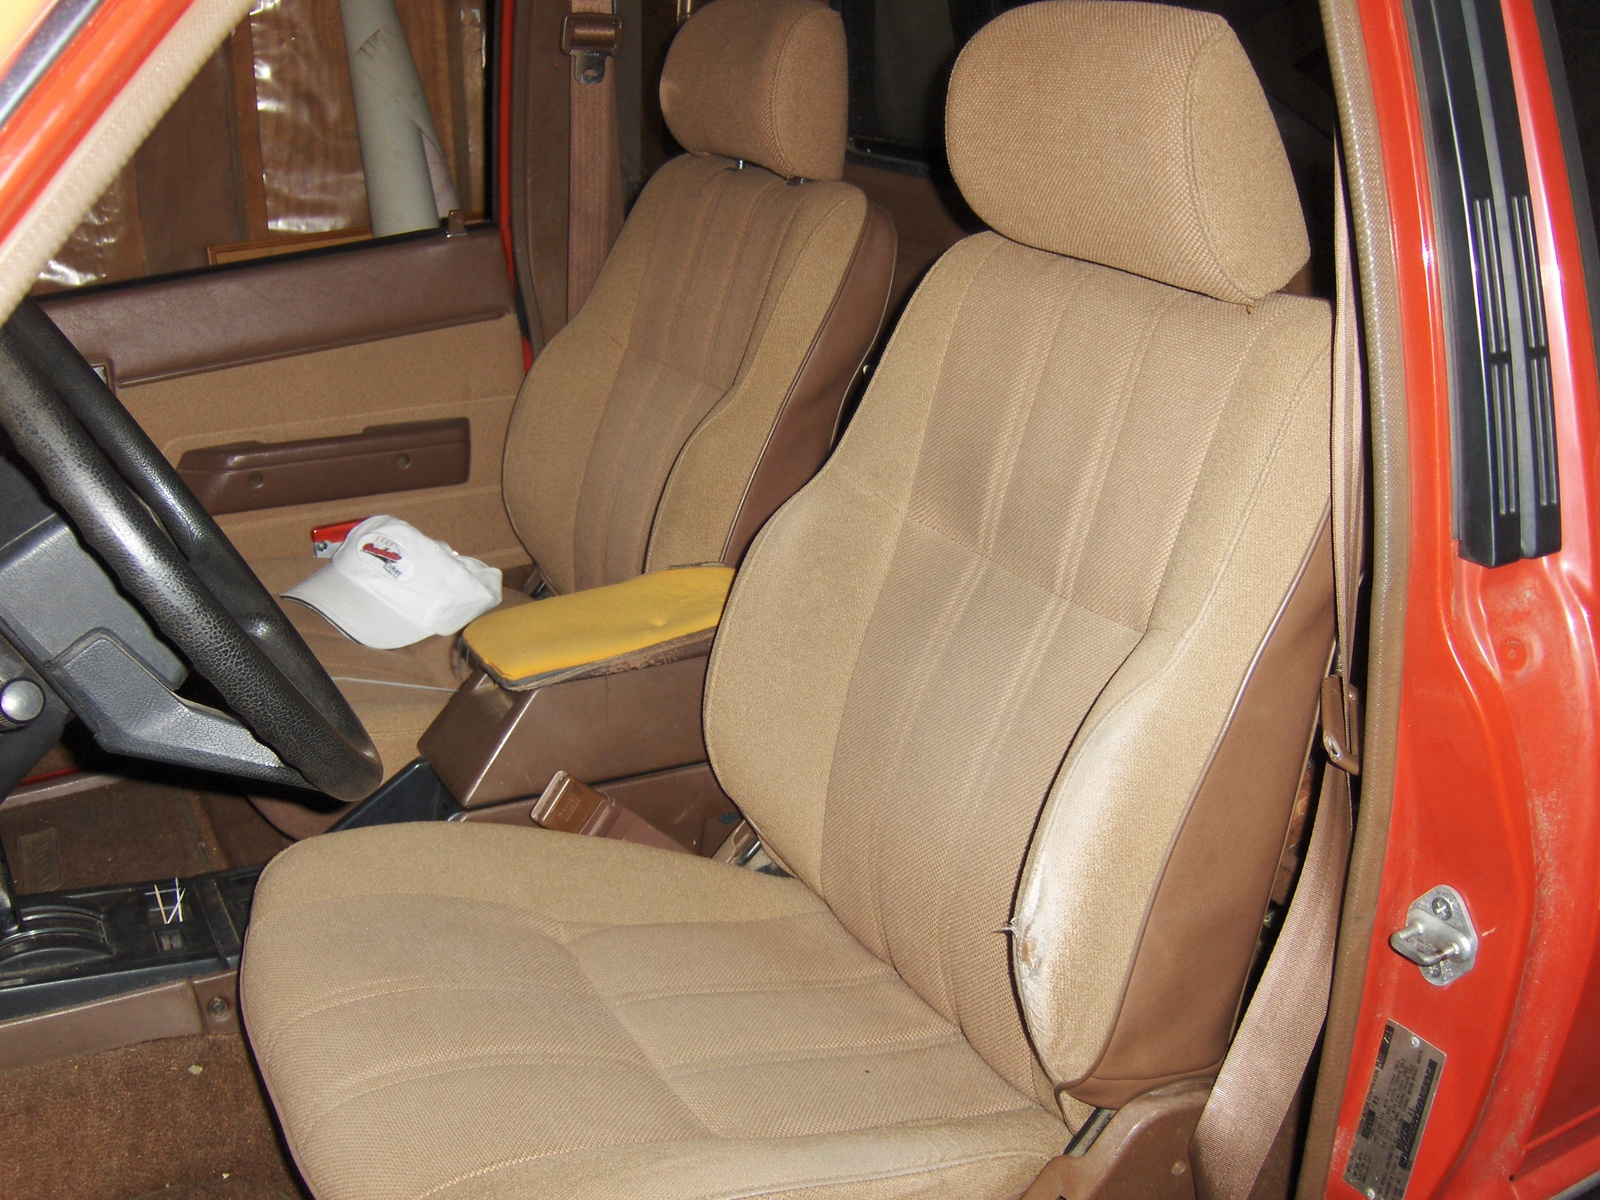 1986 toyota pickup interior pictures cargurus for 1985 toyota pickup interior parts